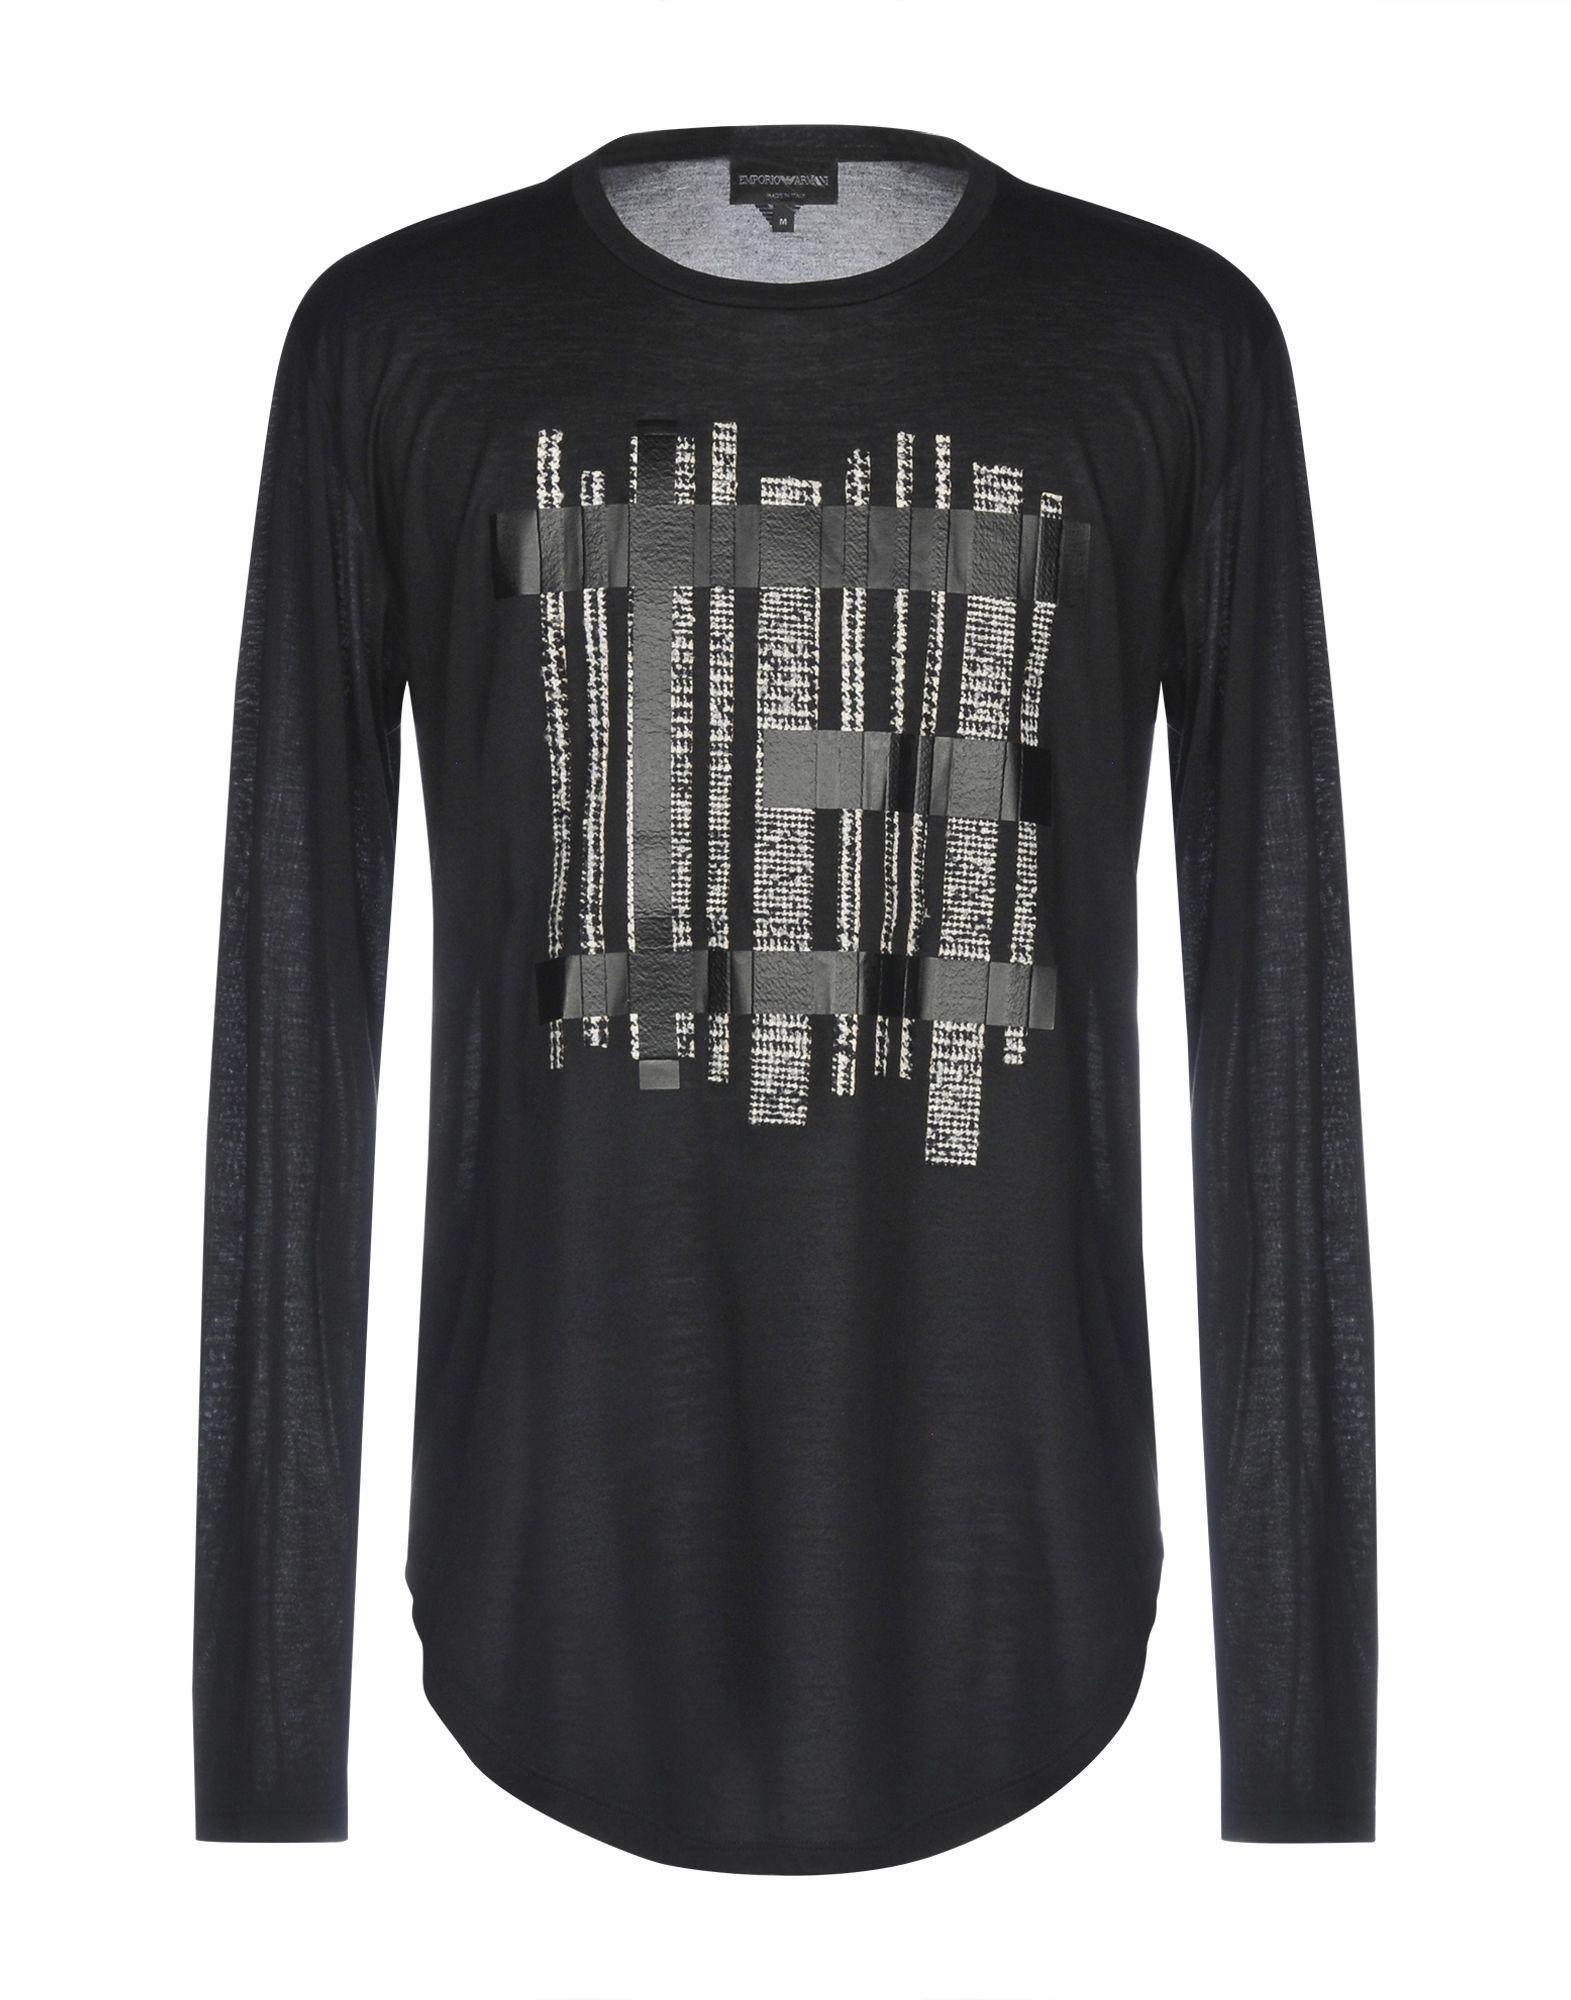 T-Shirt Emporio Armani Uomo 12209339FG - 12209339FG Uomo fad2f1